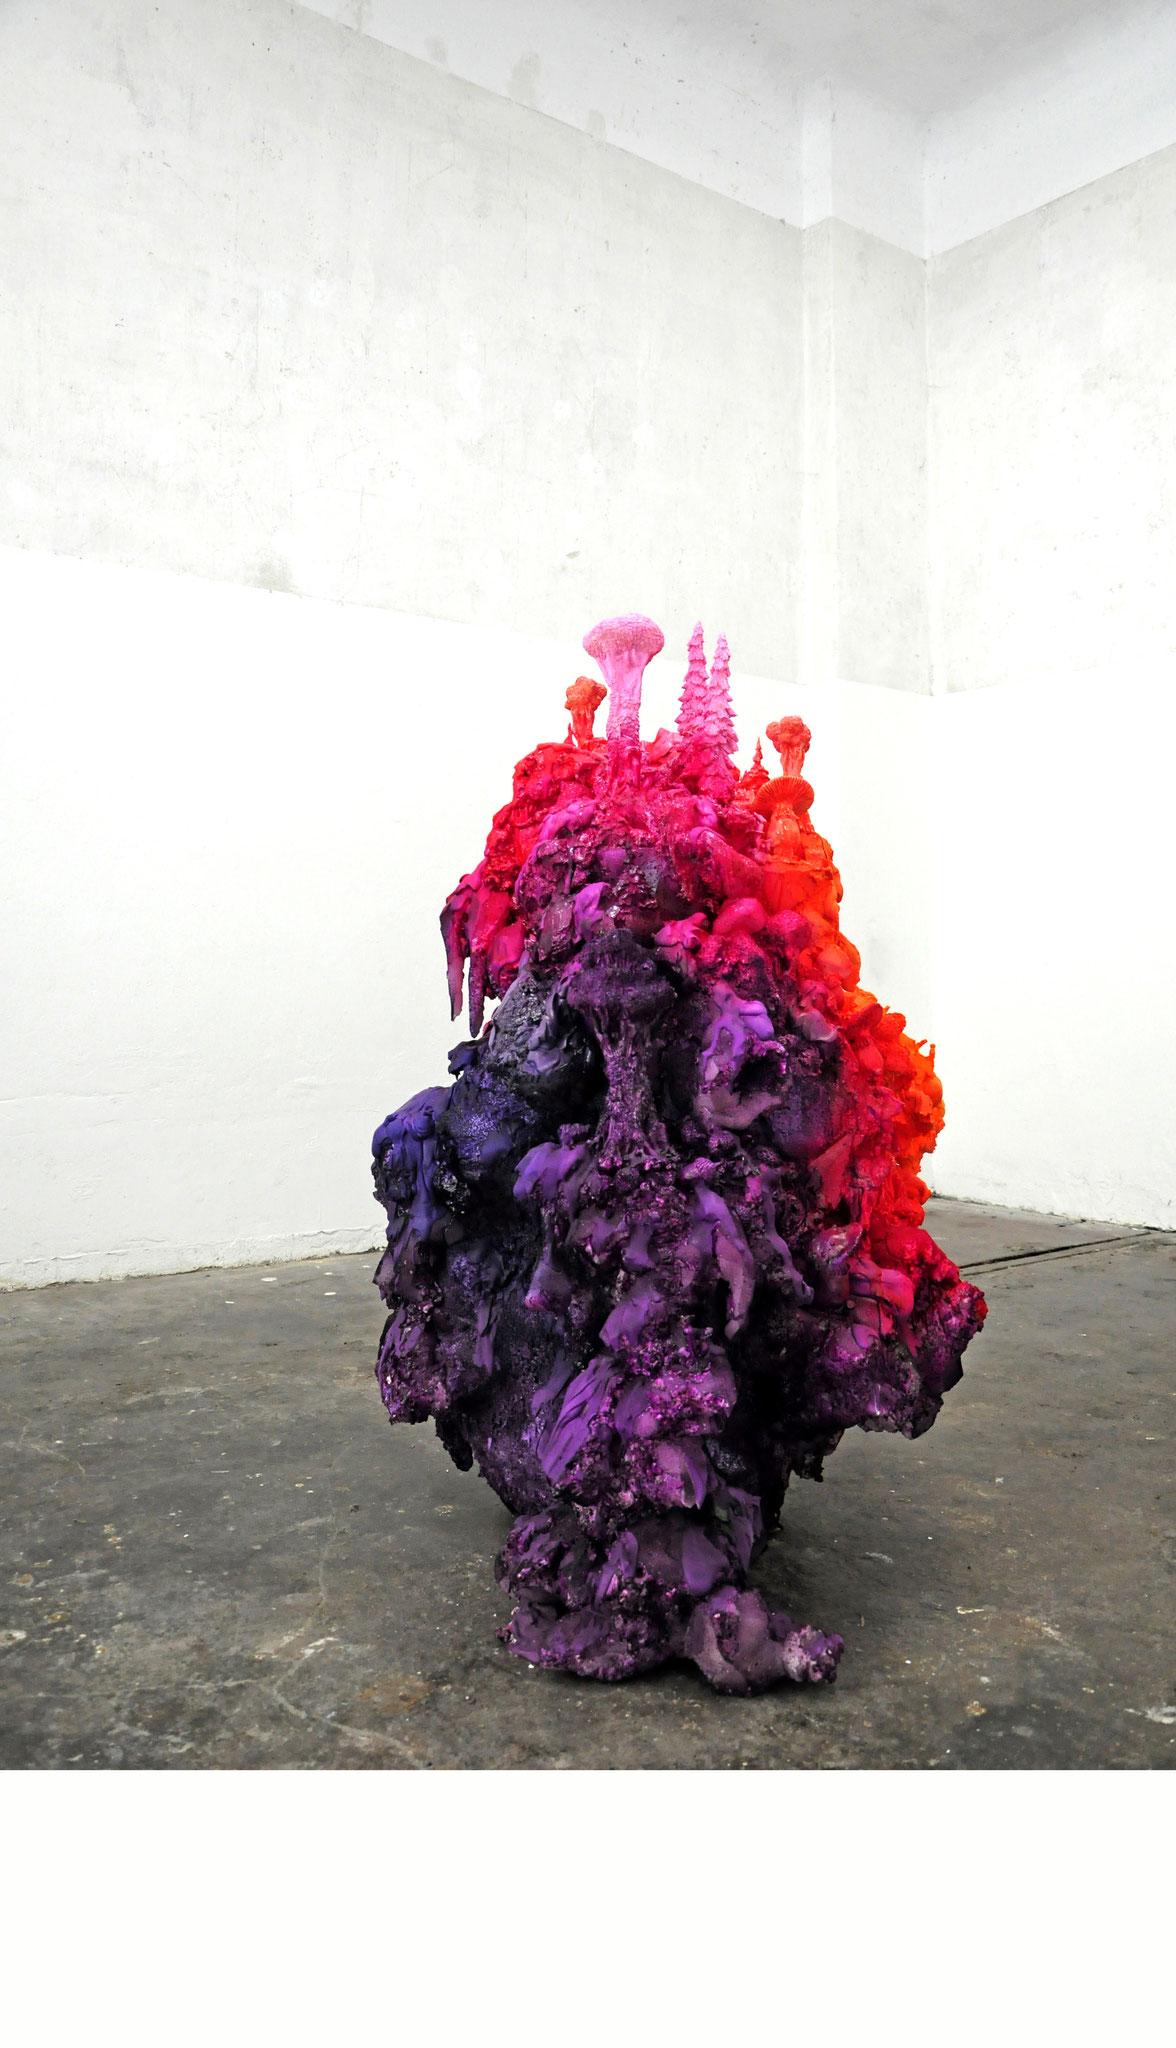 """Und irgendwo im Wald lacht ein Fuchs"", 2017, polymer, styropor, PU-foam, plaster, color, 120x100x70cm (Foto: Mareike Jacobi)"